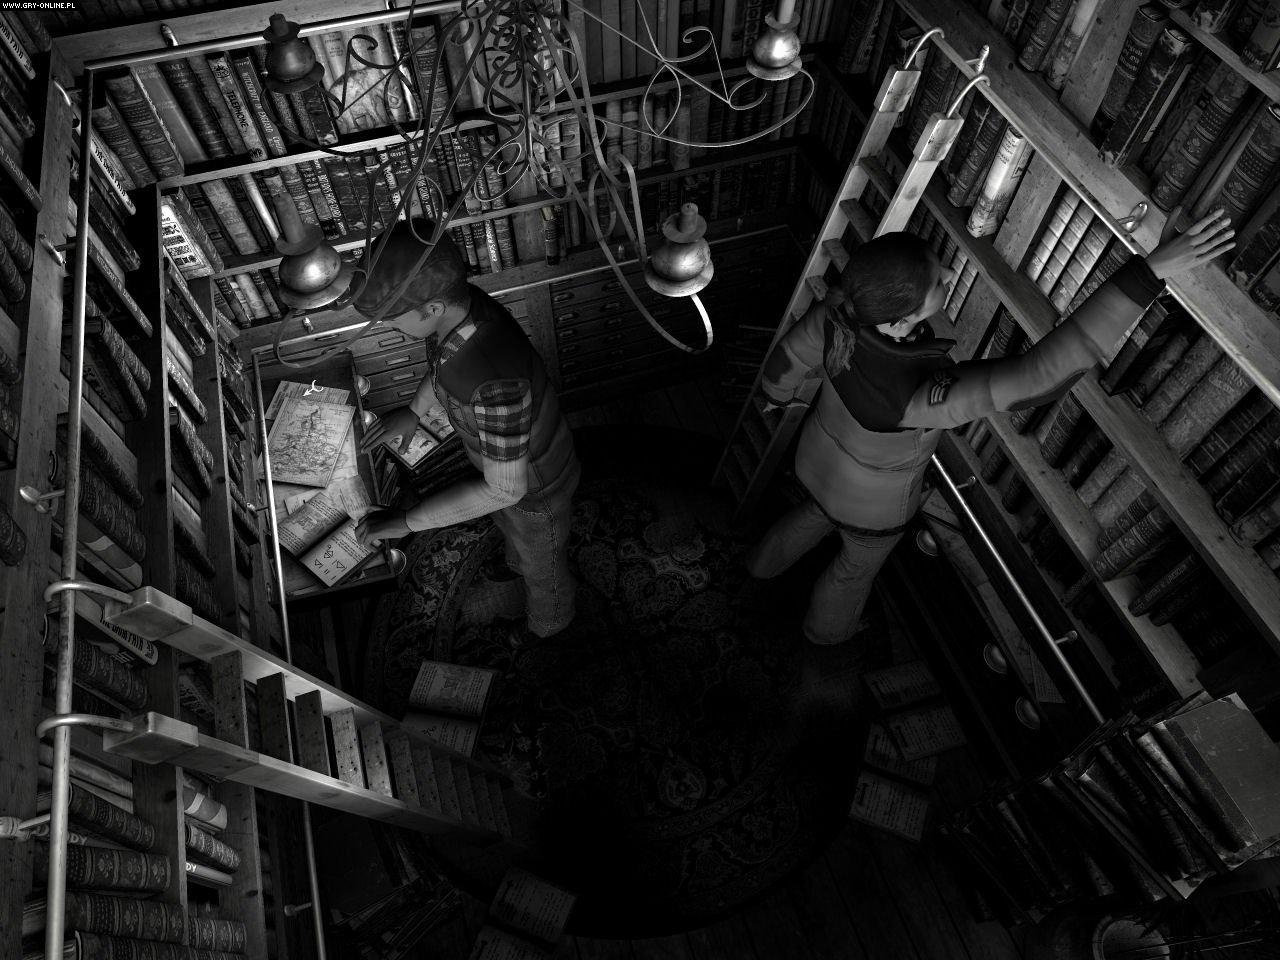 Darkling Room Games